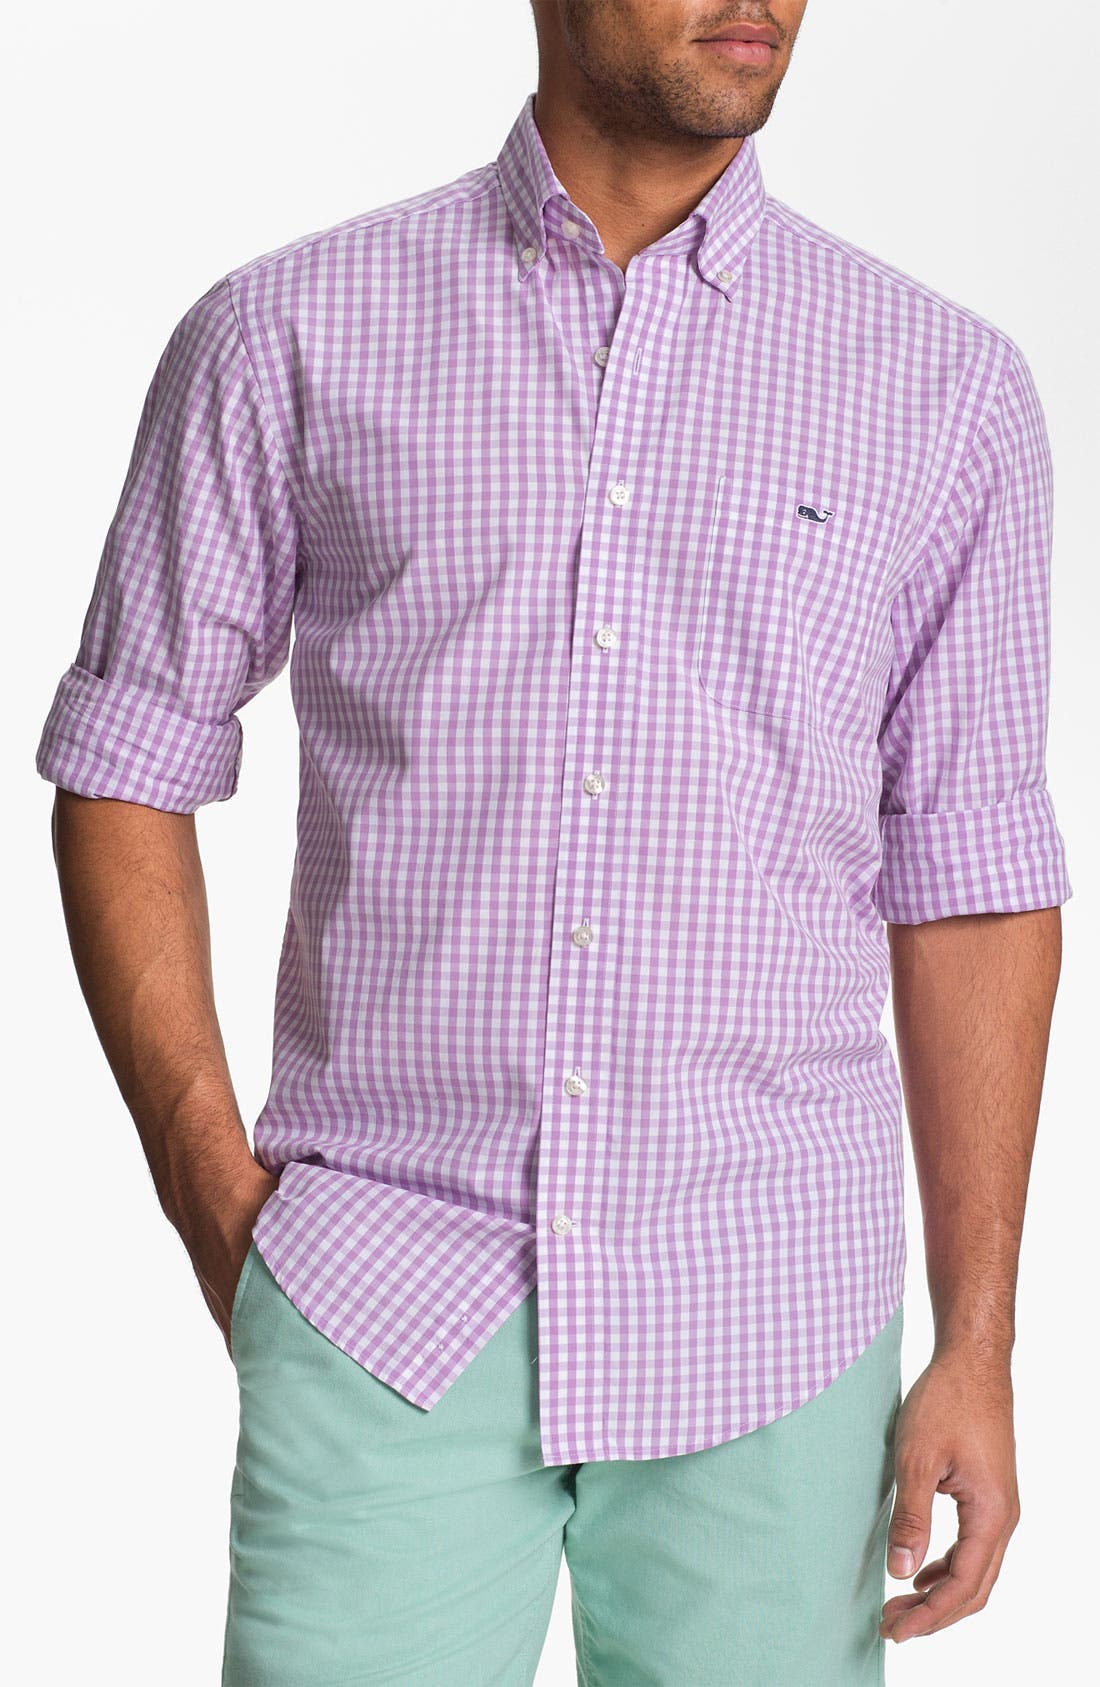 Alternate Image 1 Selected - Vineyard Vines 'Sandy Point - Tucker' Sport Shirt